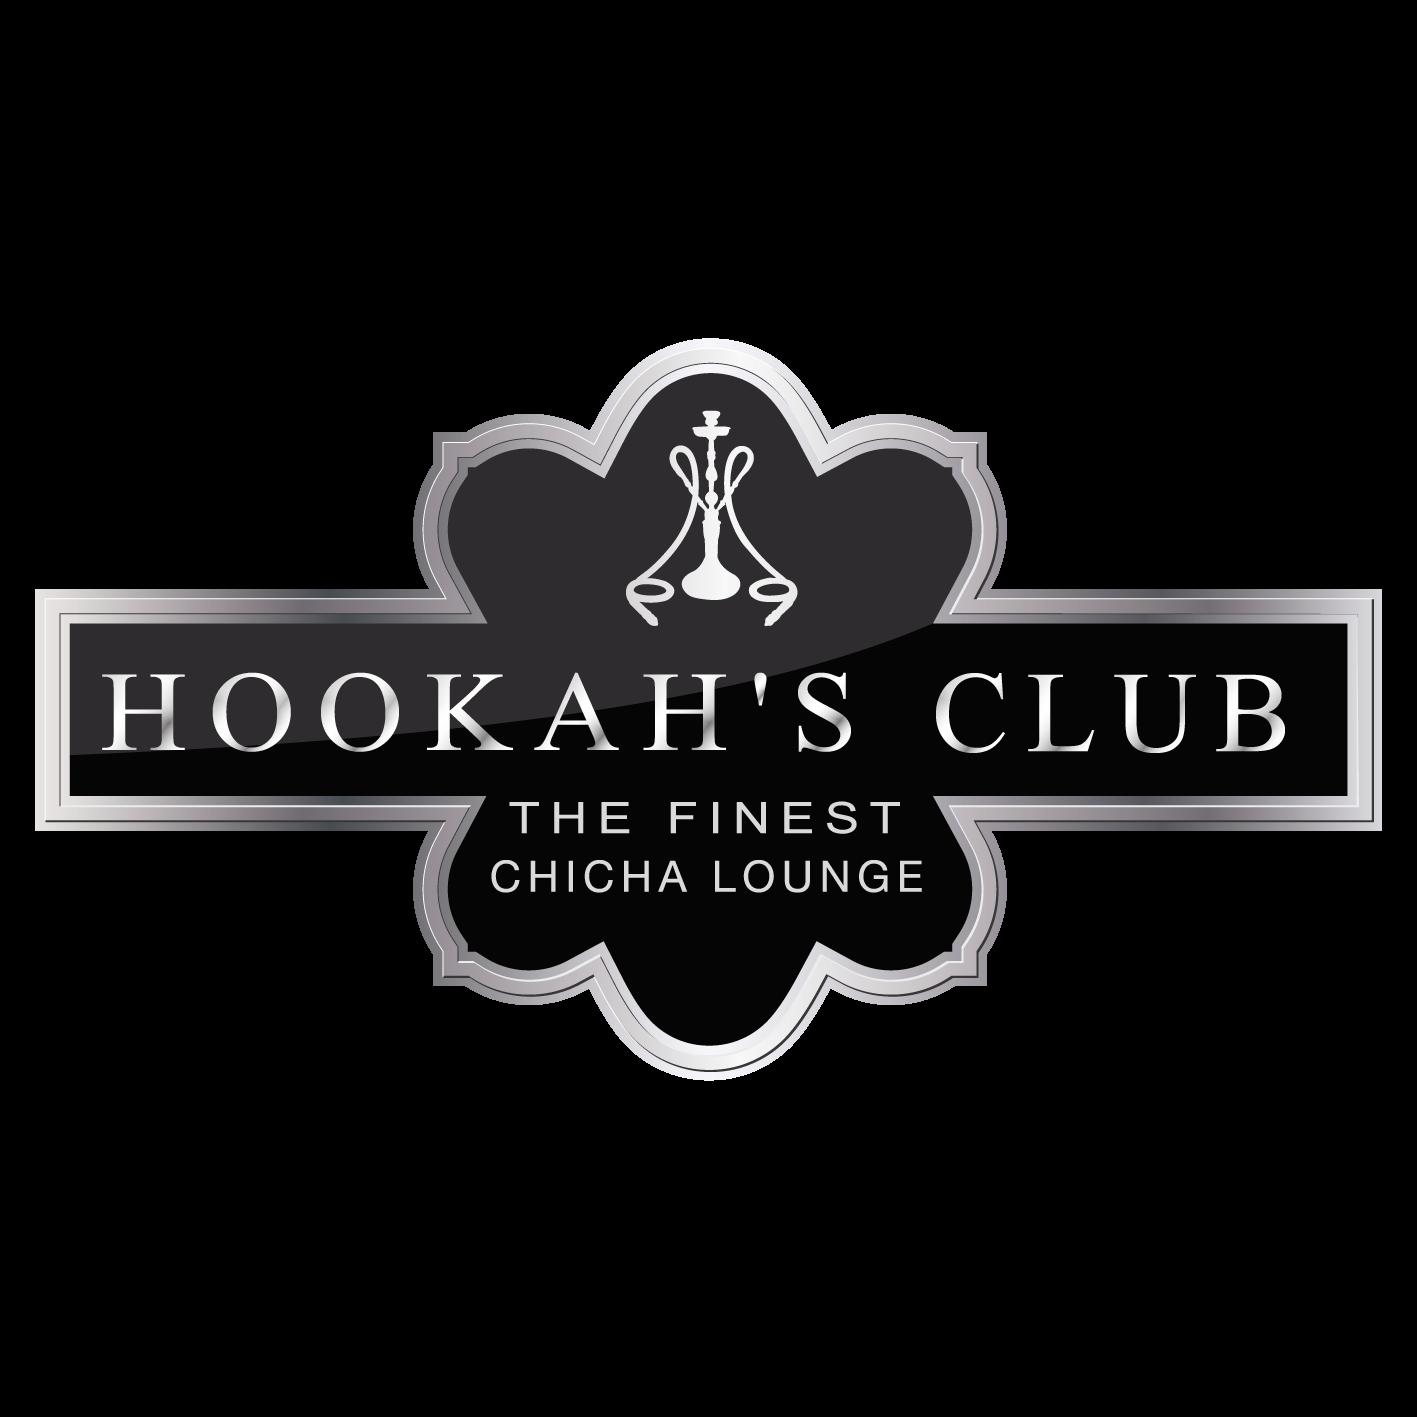 Hookah's Club